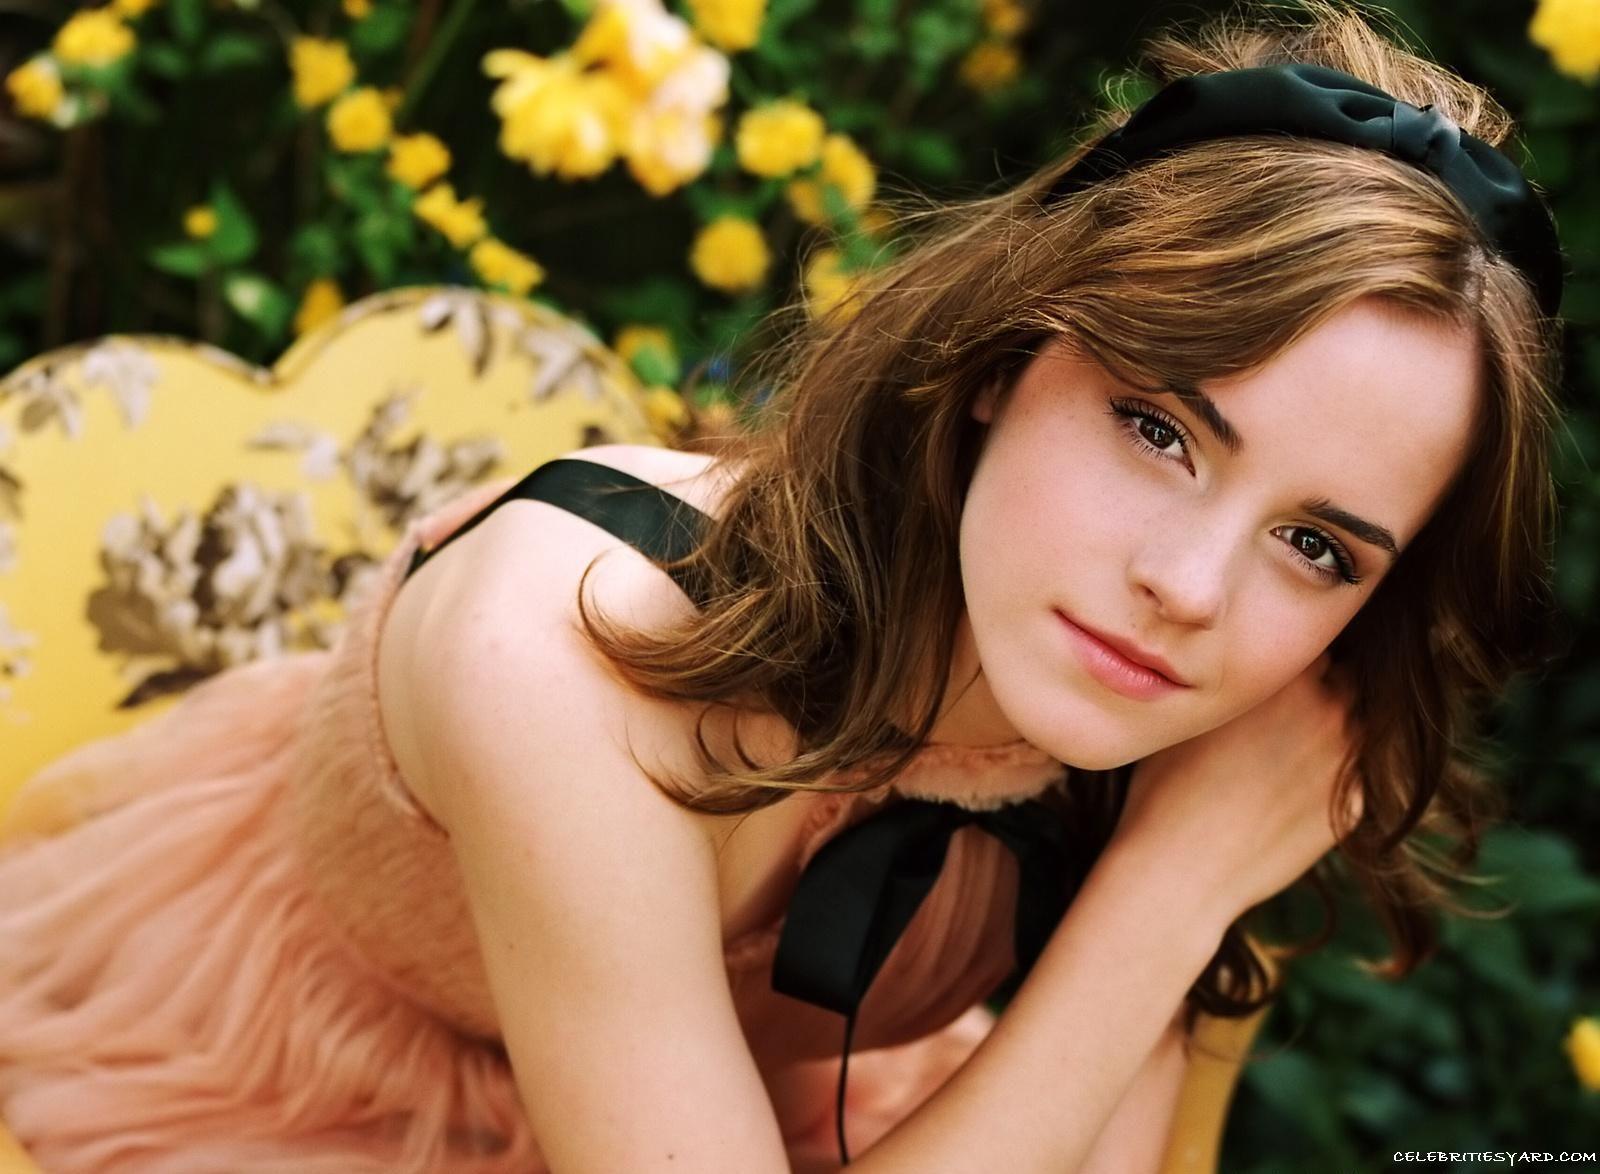 http://2.bp.blogspot.com/-A527g1gblzU/ThqeMsItL6I/AAAAAAAAA_k/b3W_yebO34M/s1600/Emma-Watson-wallpaper-5.jpg